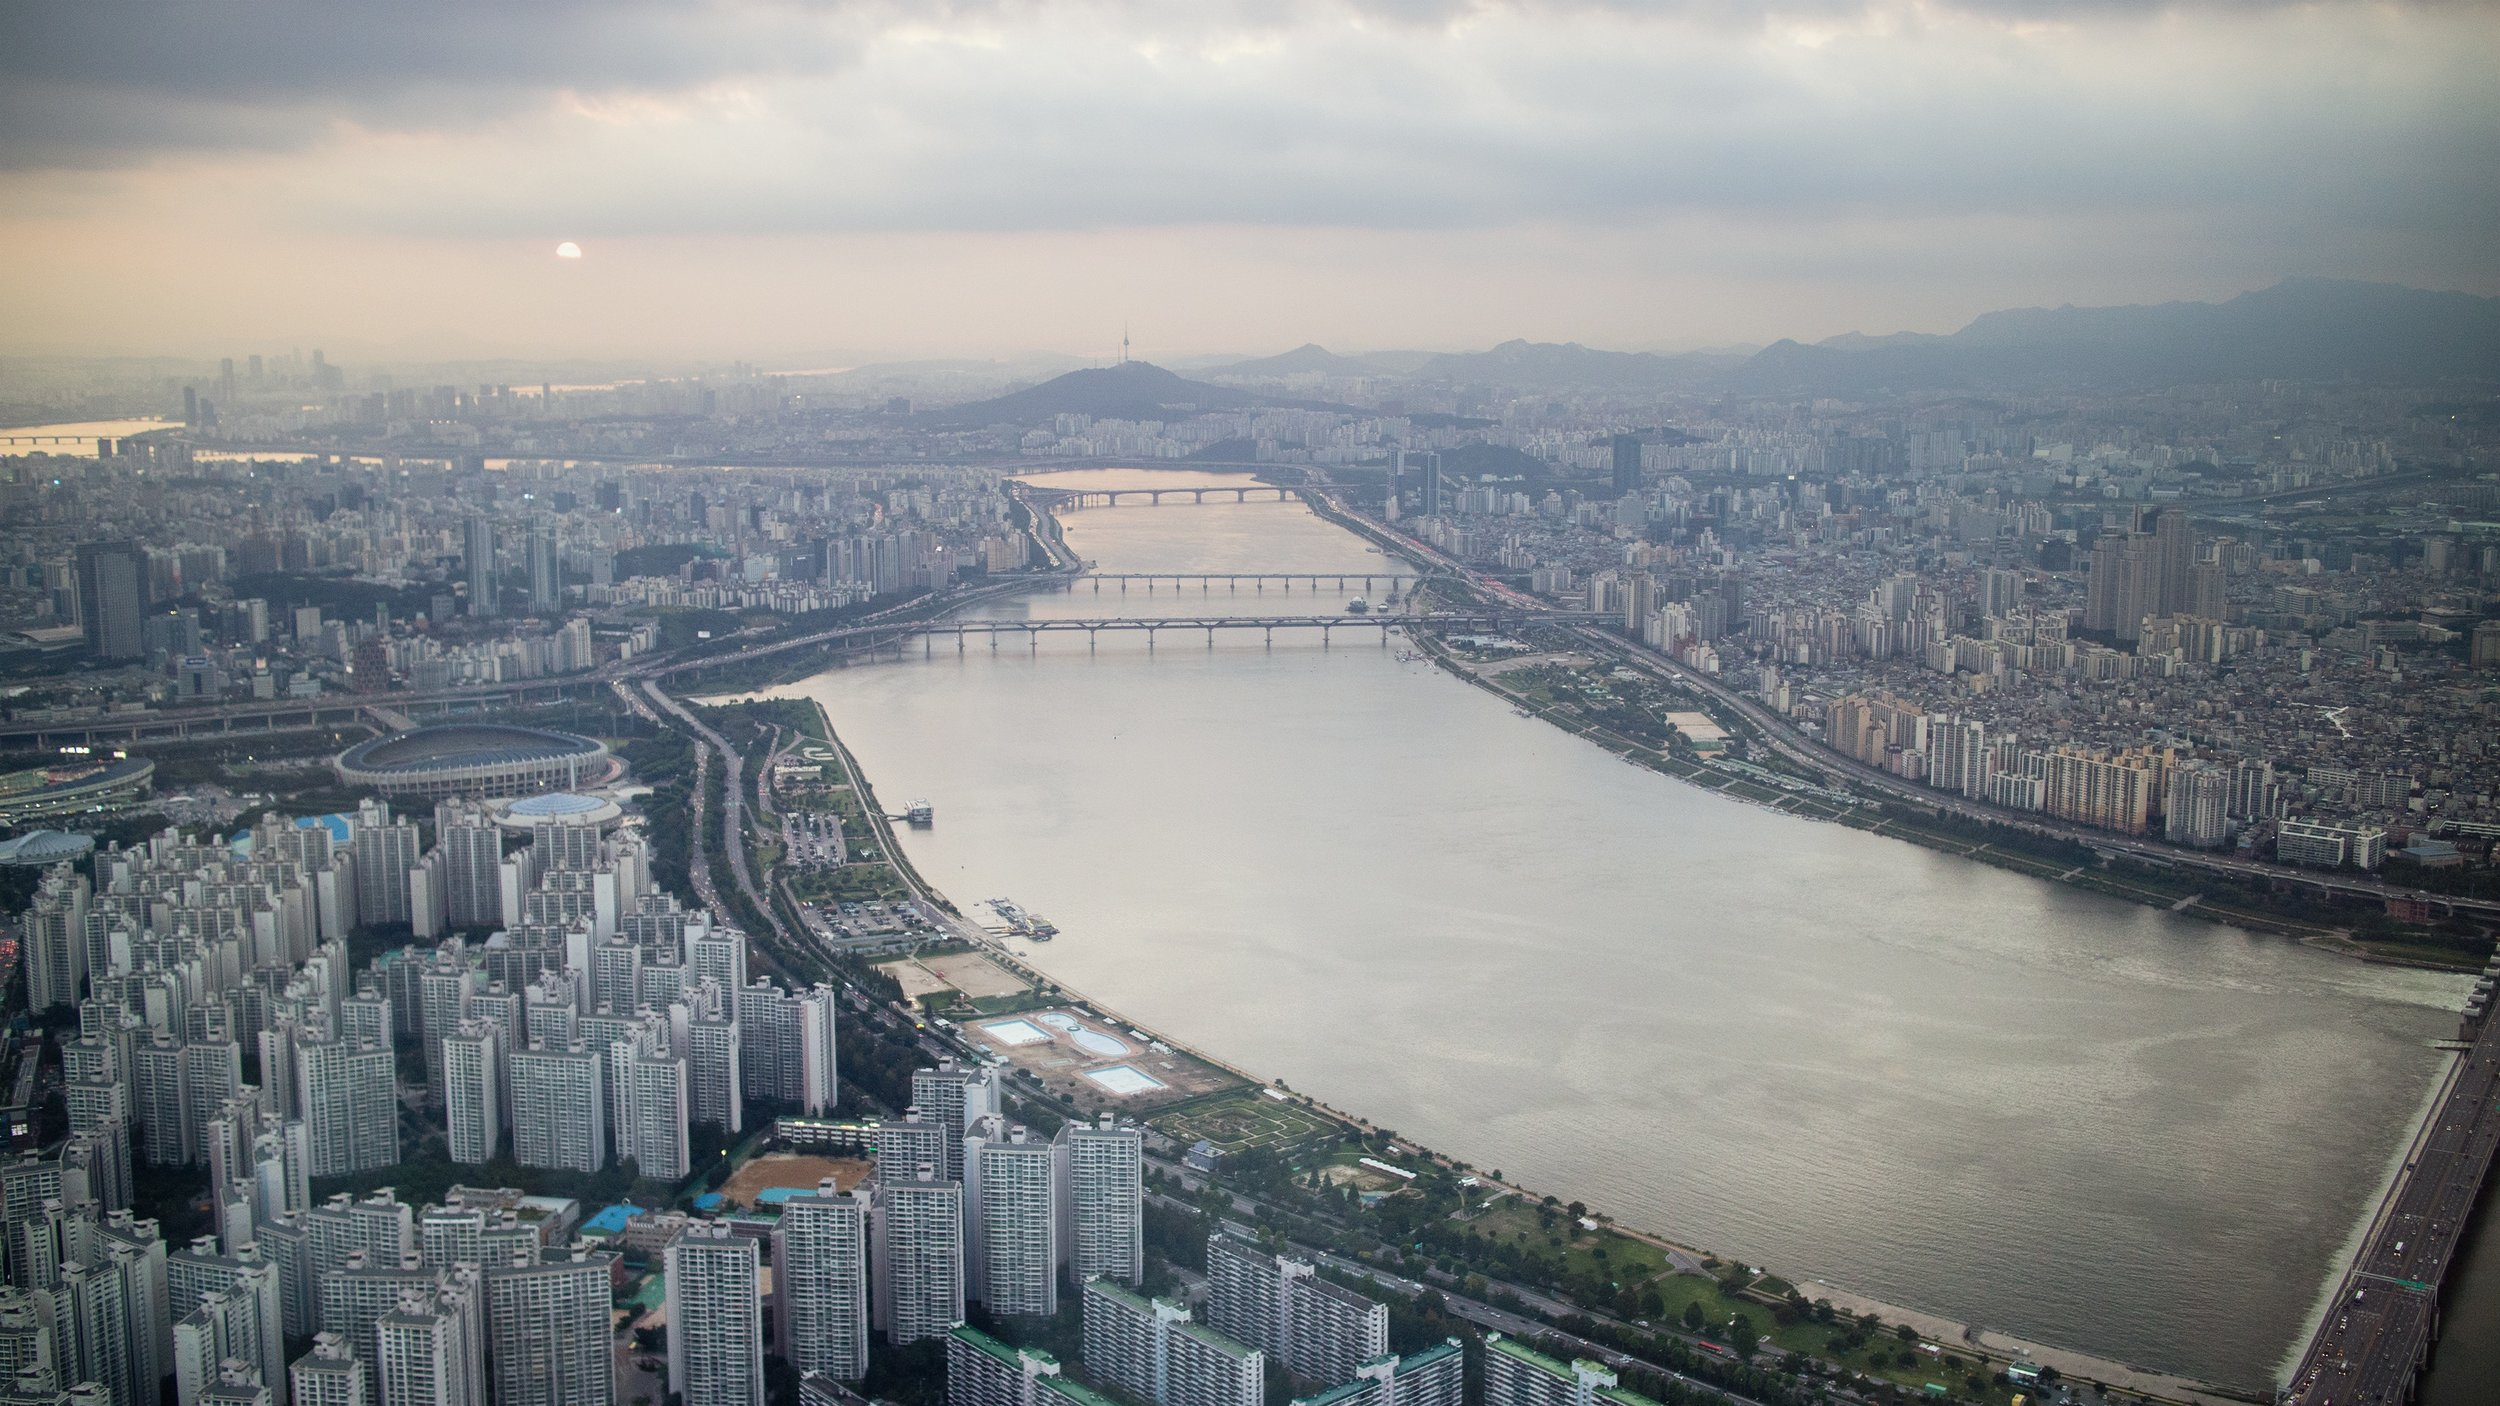 must-visit-places-in-seoul-korea